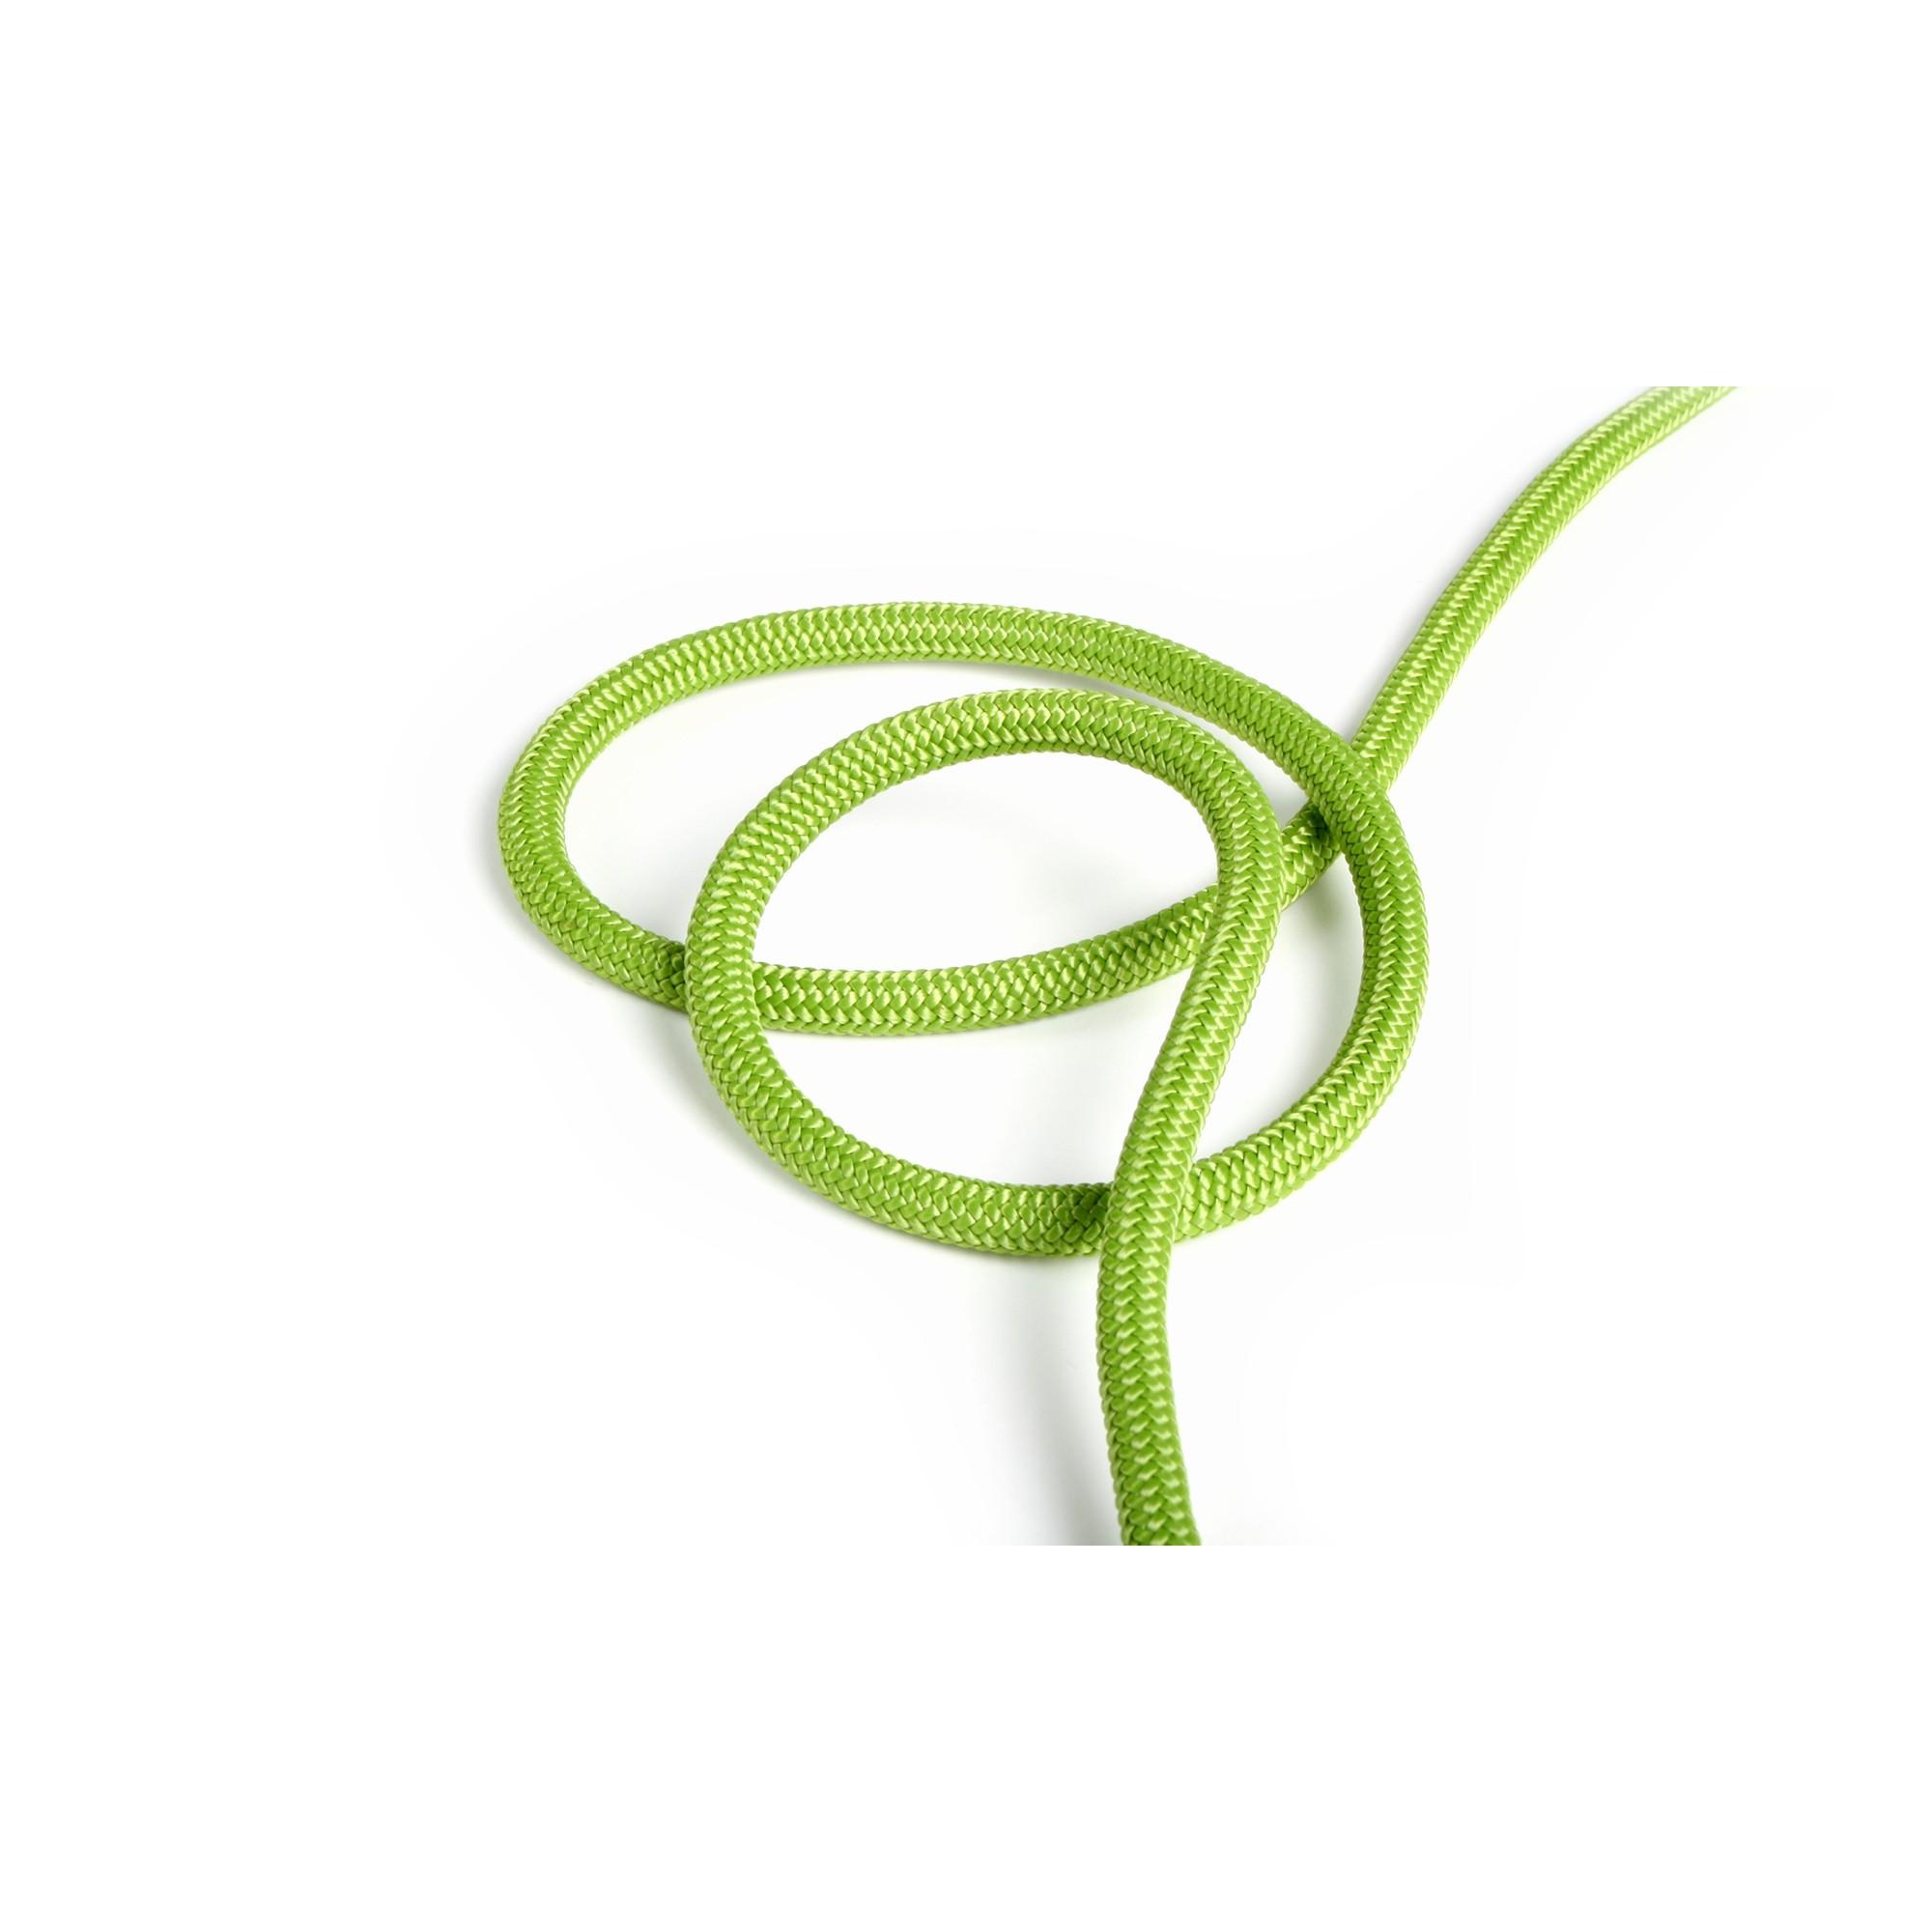 Cord 6 mm